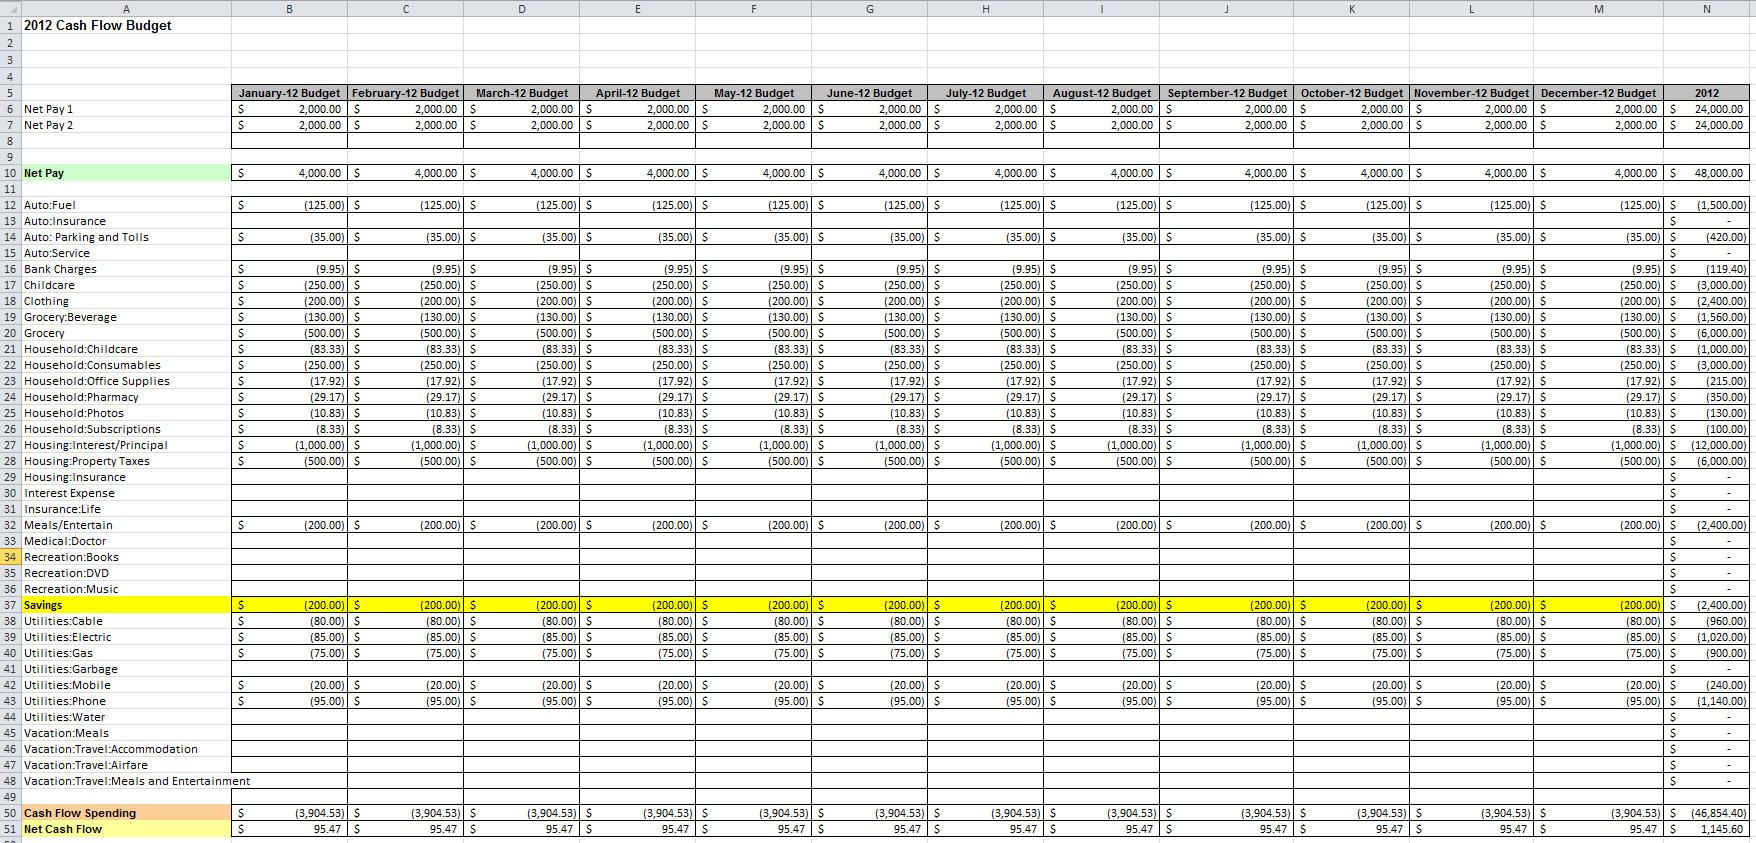 Cash Flow Budget Spreadsheet Regarding Family Cash Flow Spreadsheet 2018 Excel Spreadsheet Templates